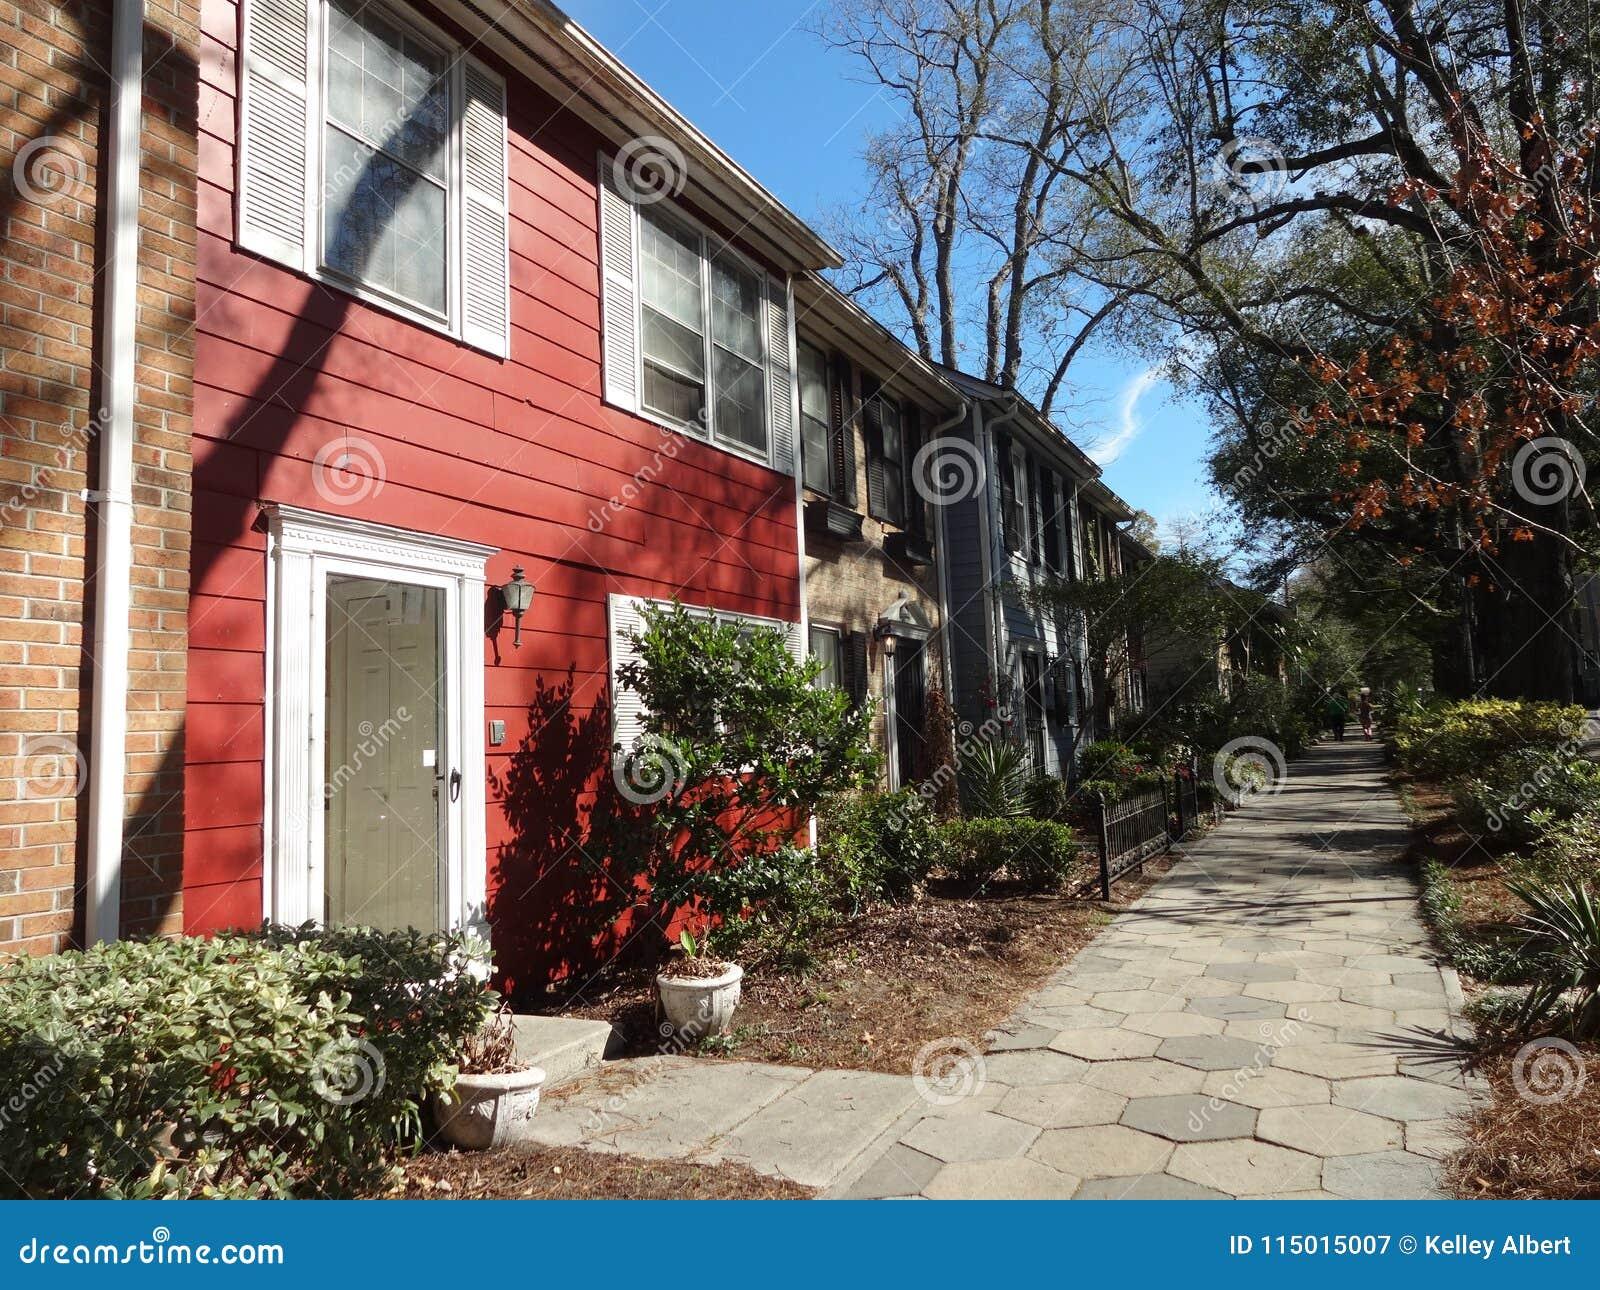 Row houses in a downtown neighborhood in Wilmington, North Carolina